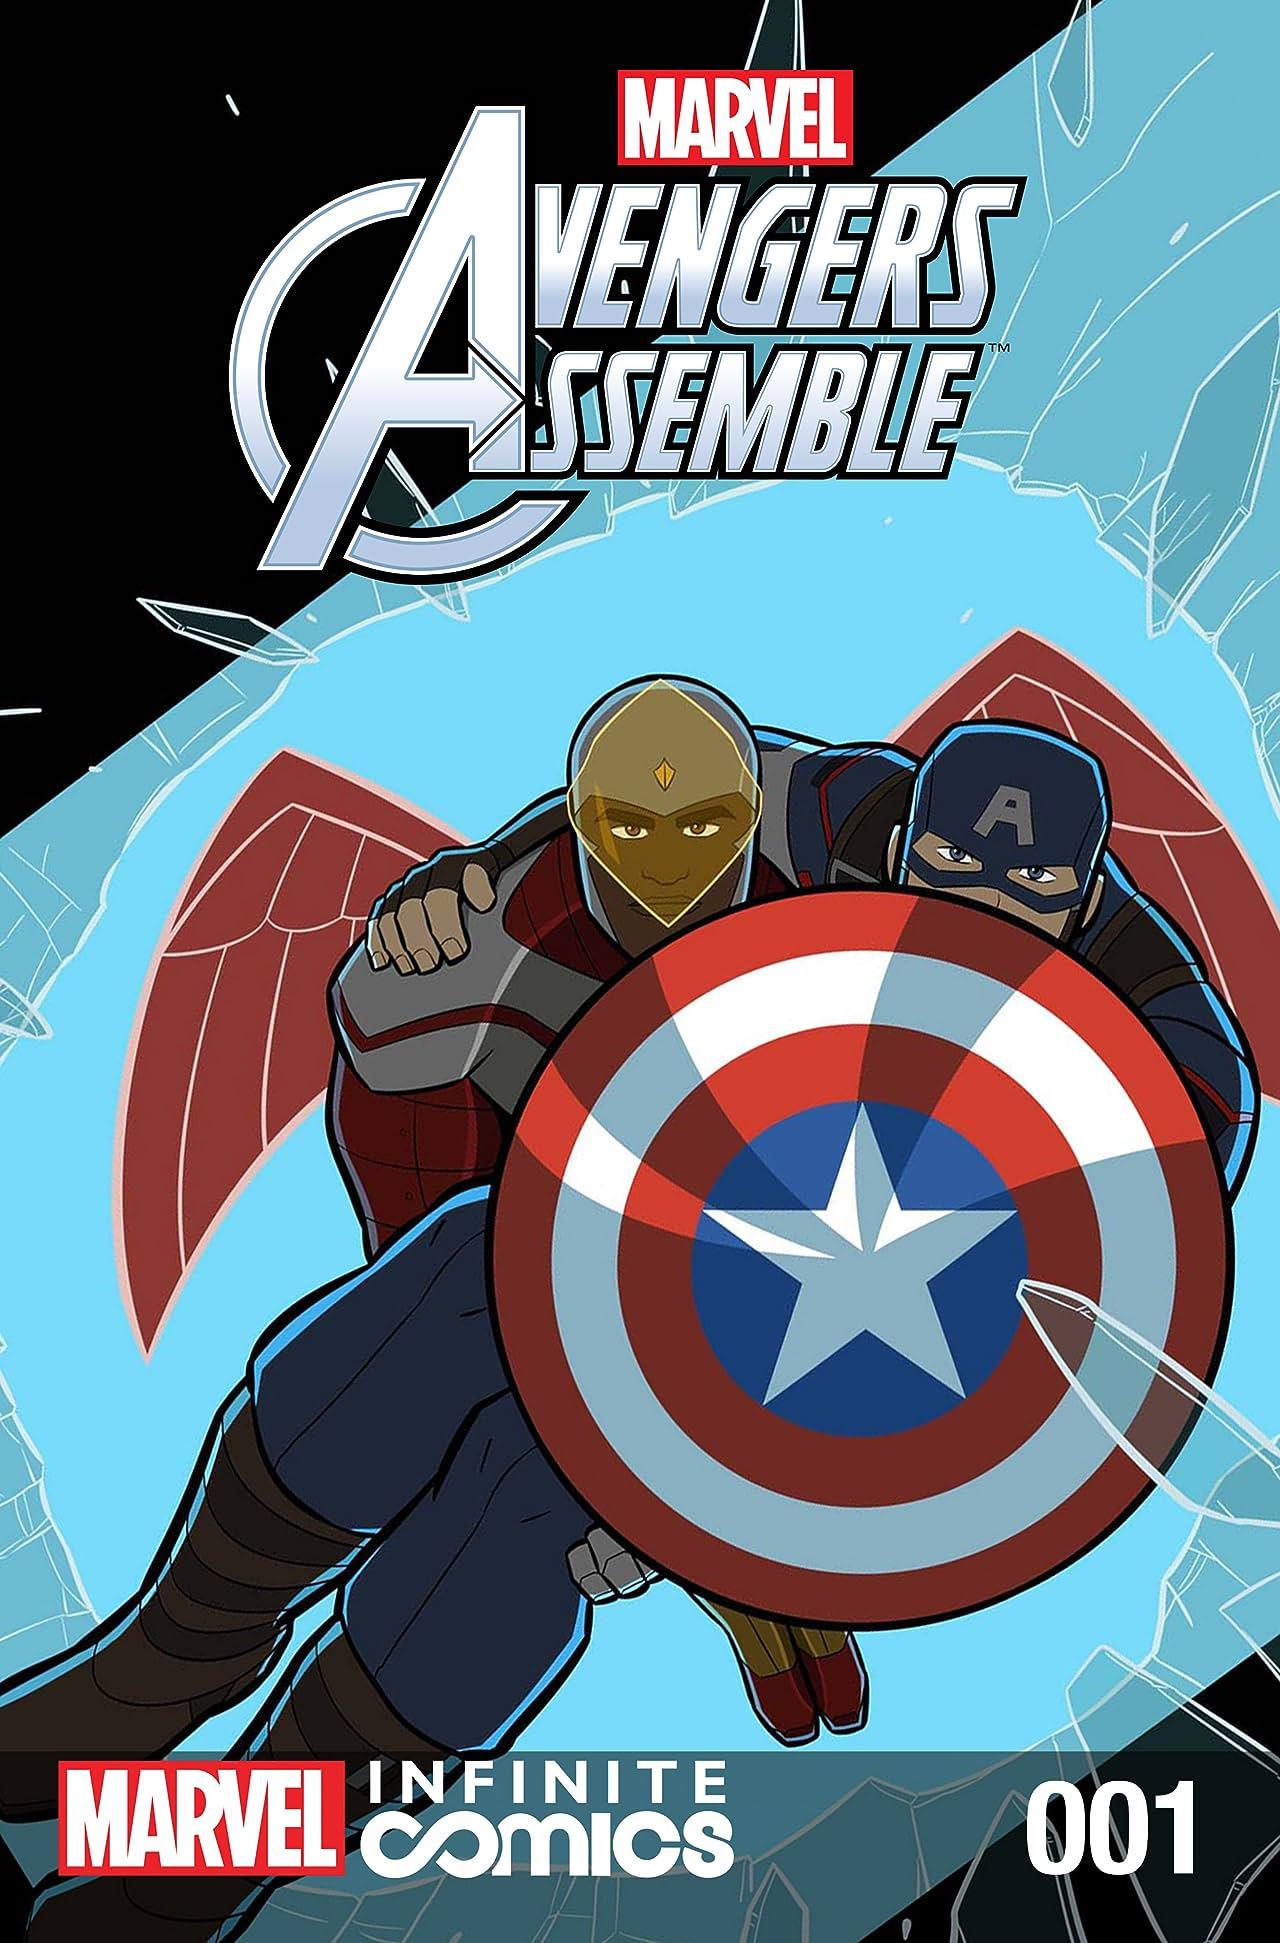 Marvel Universe Avengers Infinite Comic #1